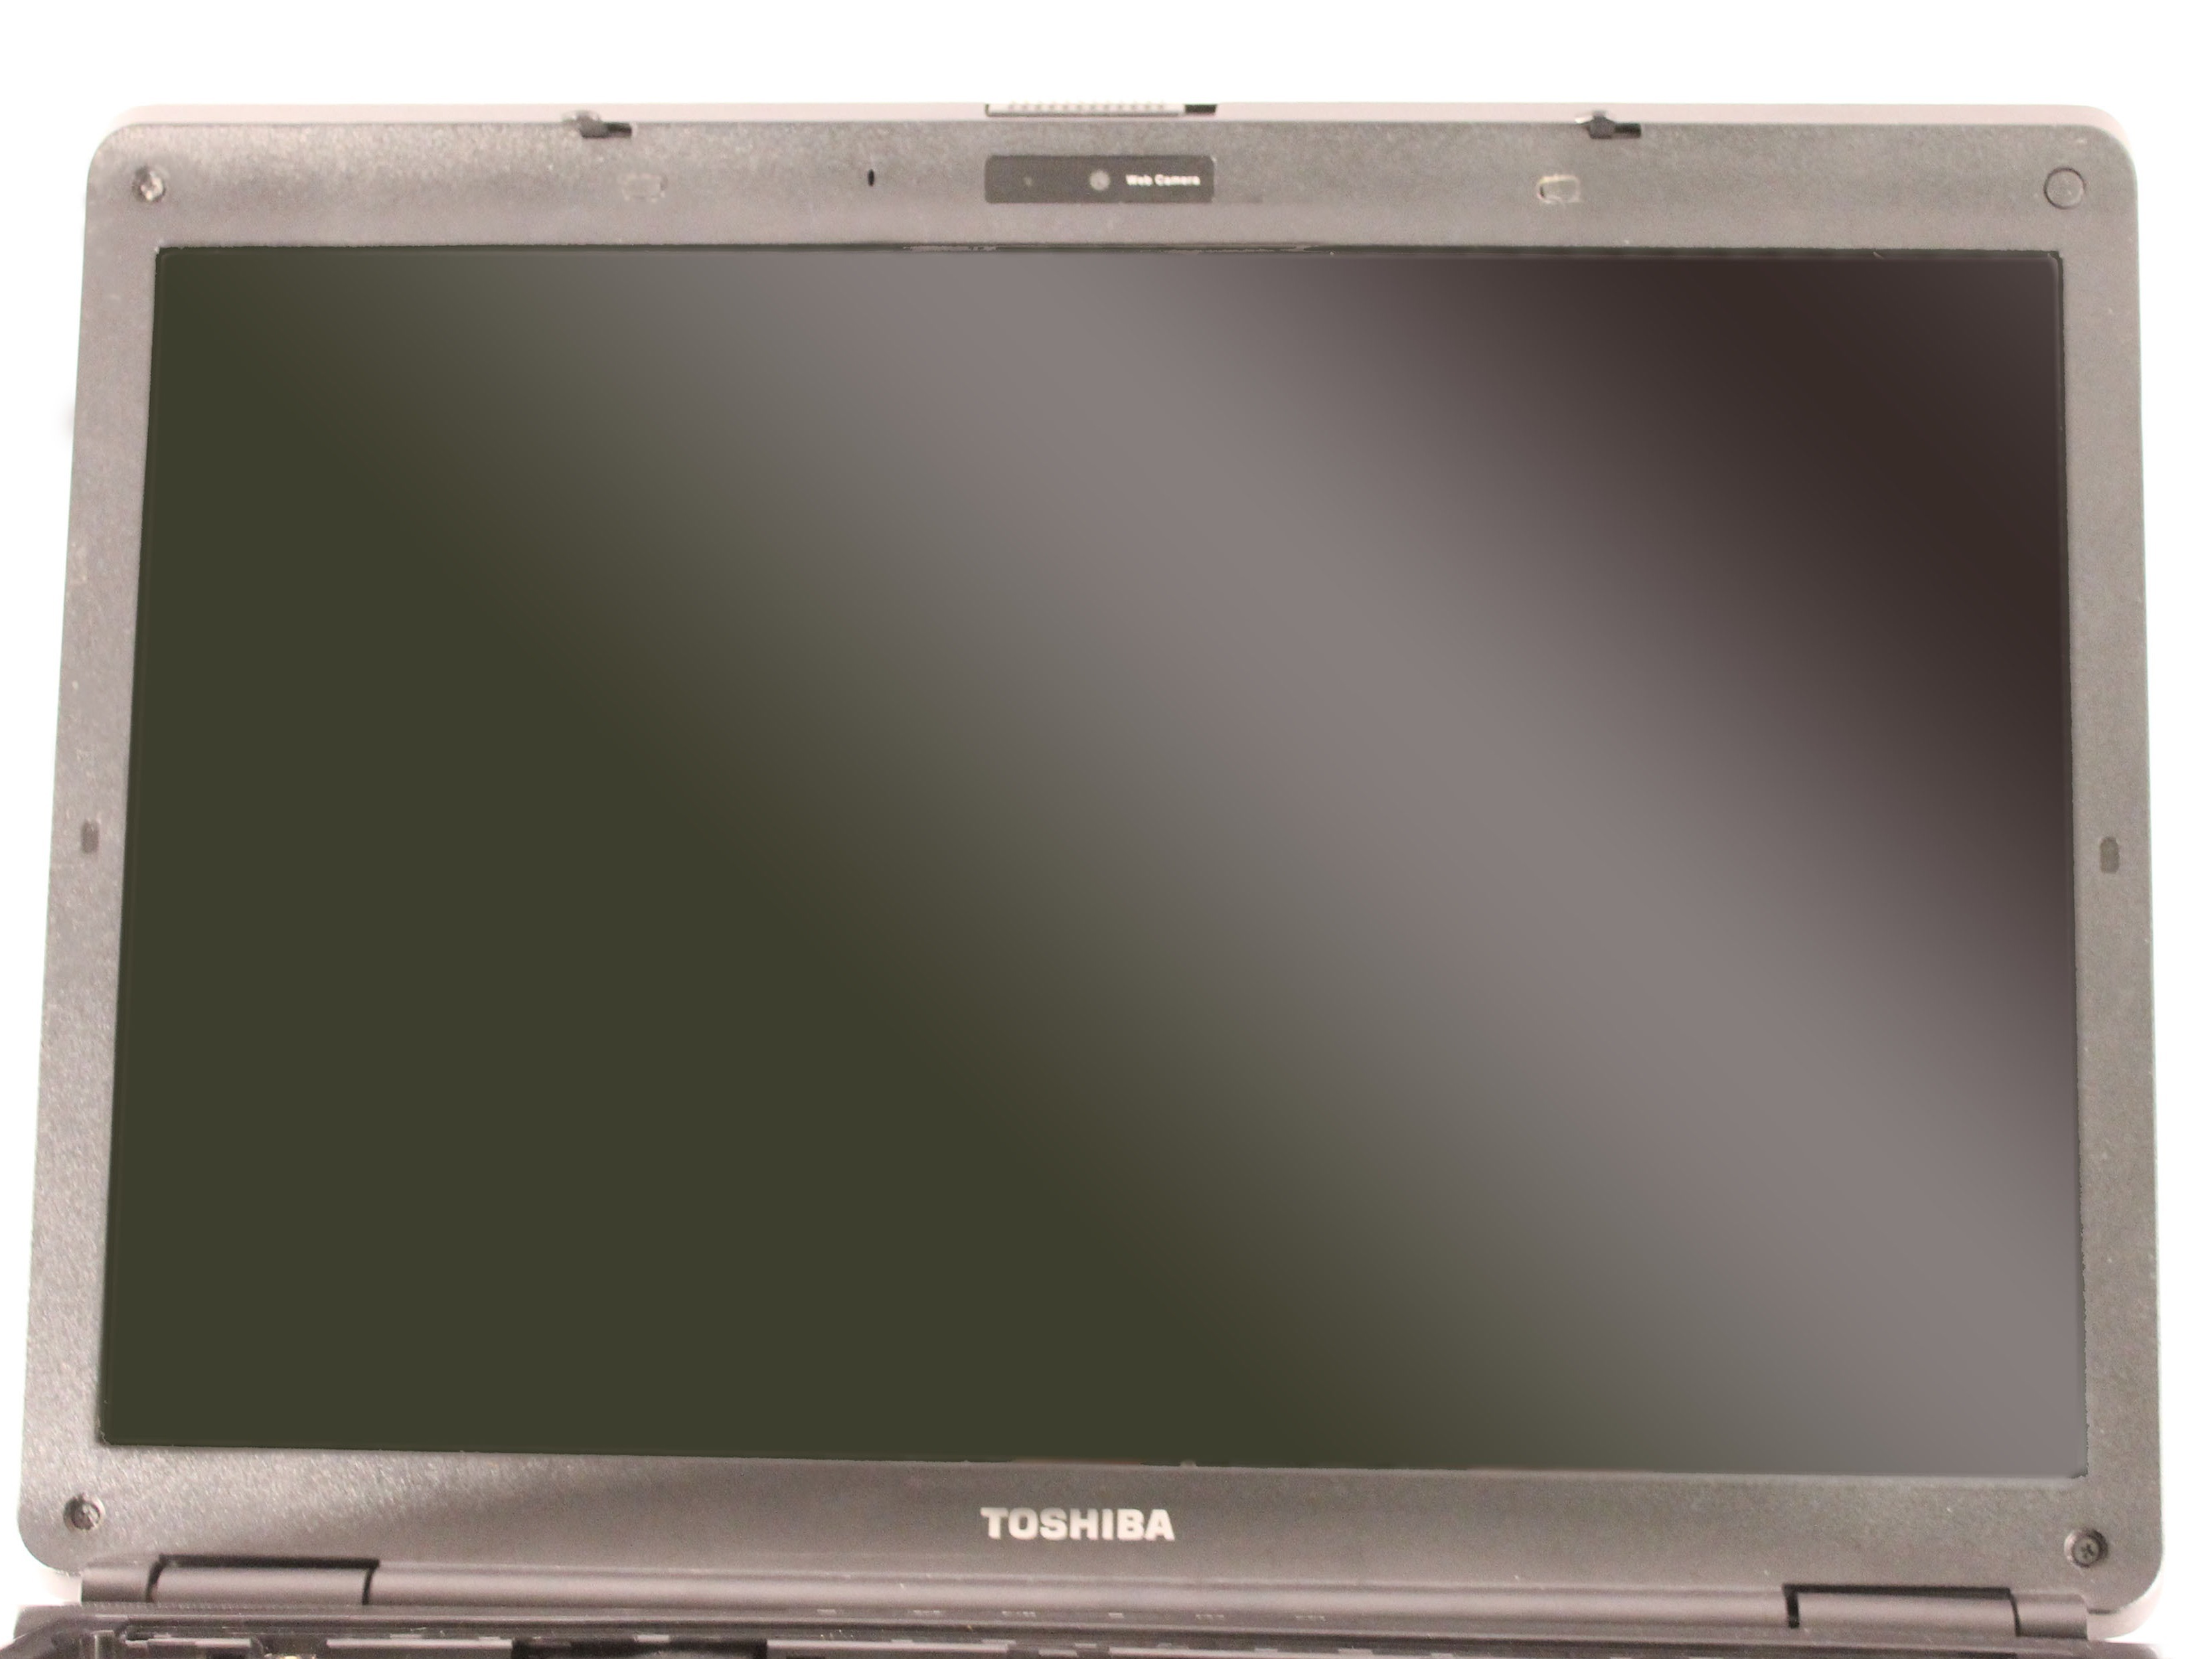 toshiba satellite l305 s5875 lcd screen replacement ifixit repair rh ifixit com Toshiba Satellite Service Manual Toshiba Satellite P55-B Ads